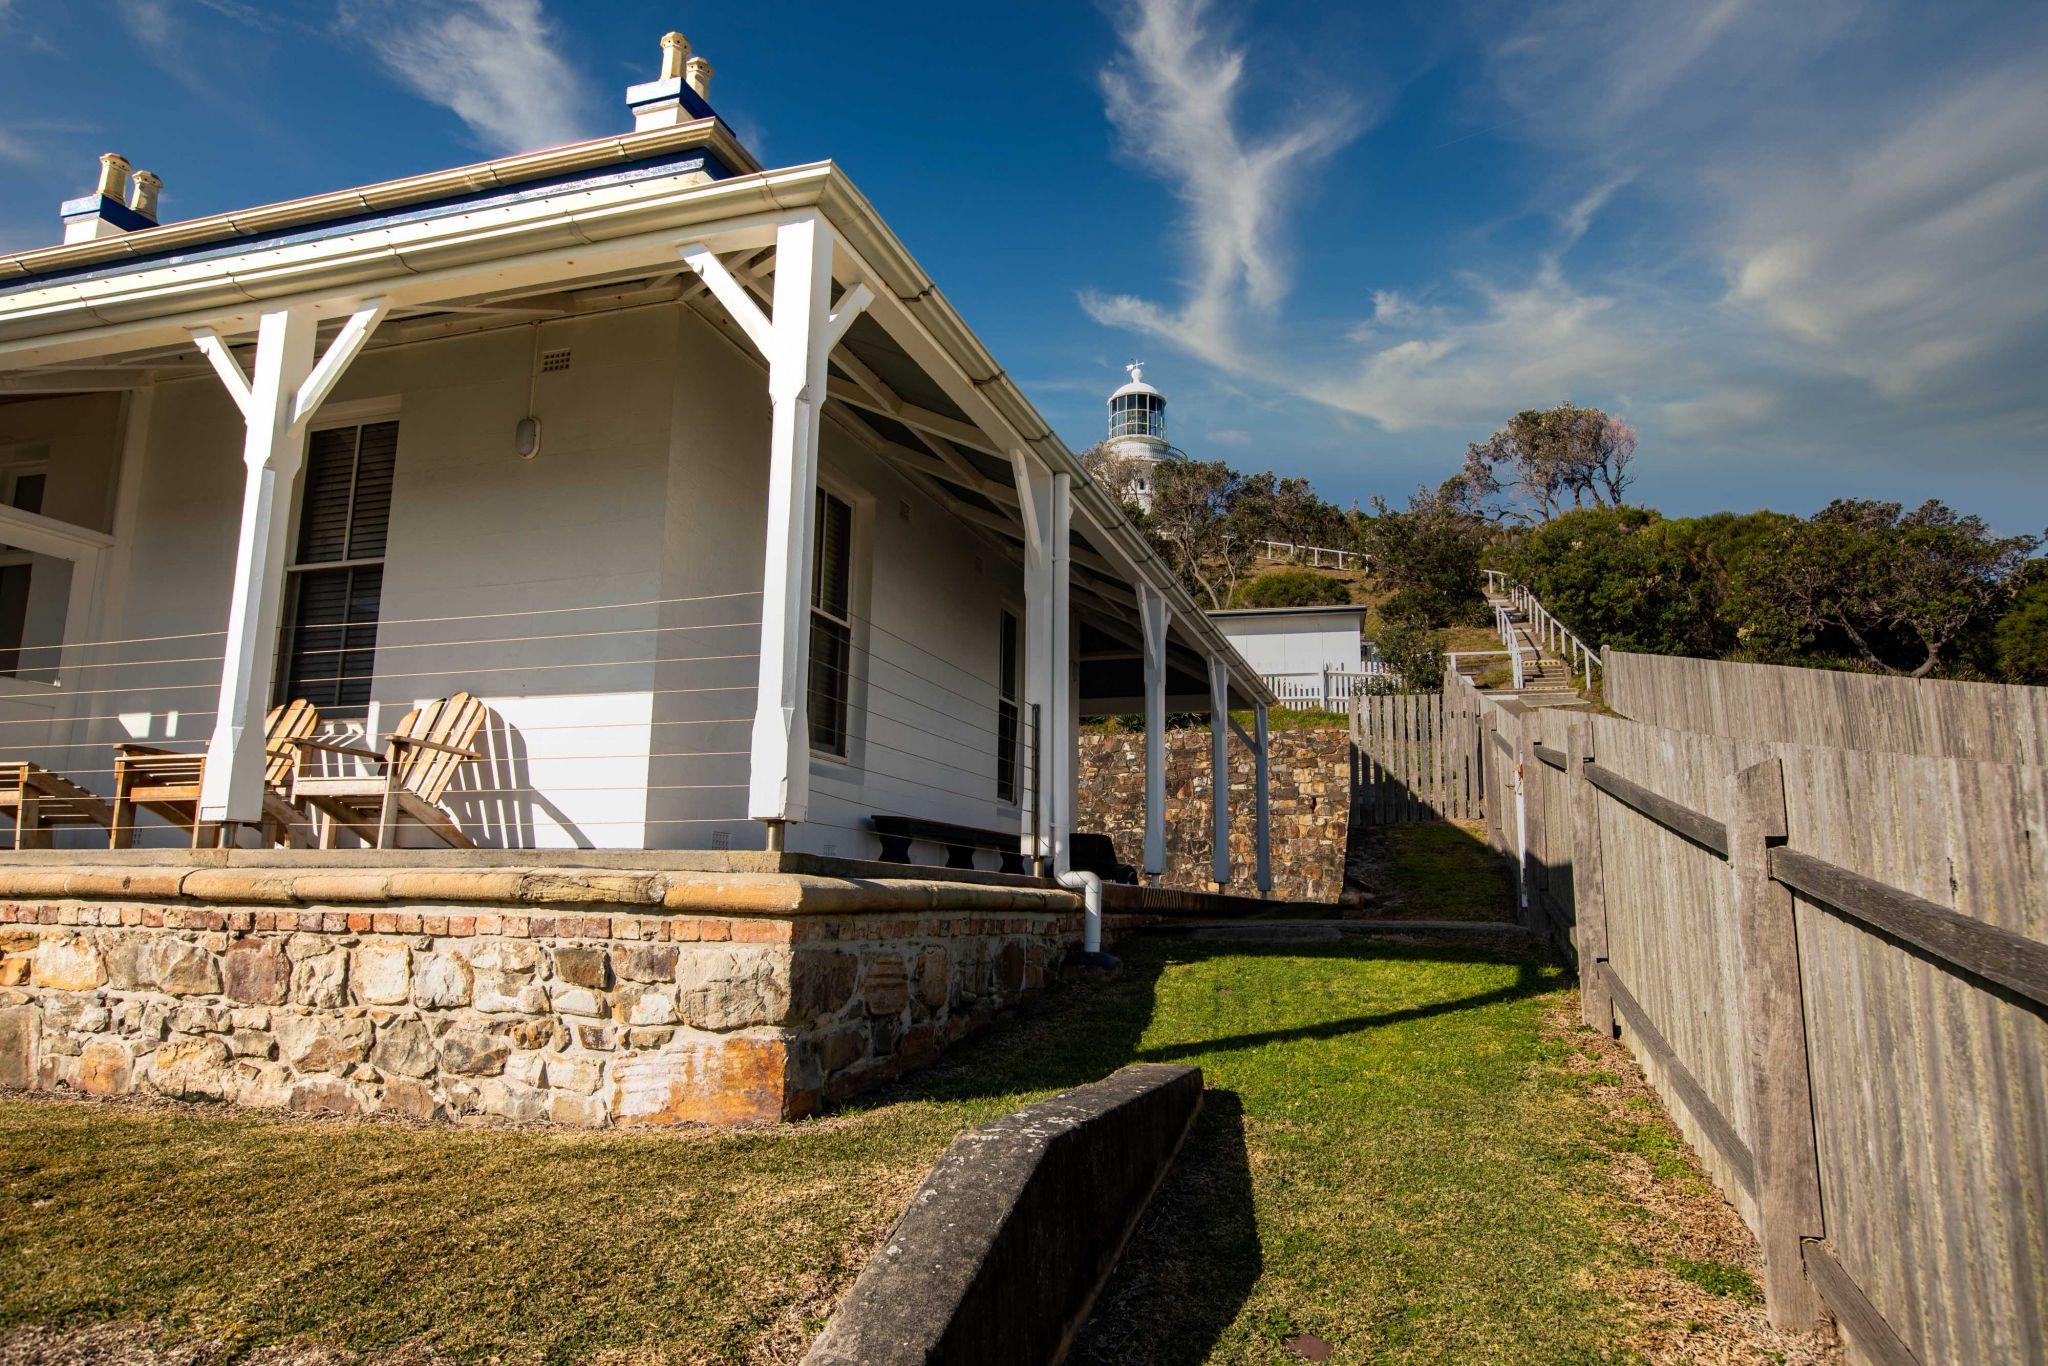 Sugarloaf Lighthouse caretakers cottage Seal Rocks NSW, Australia